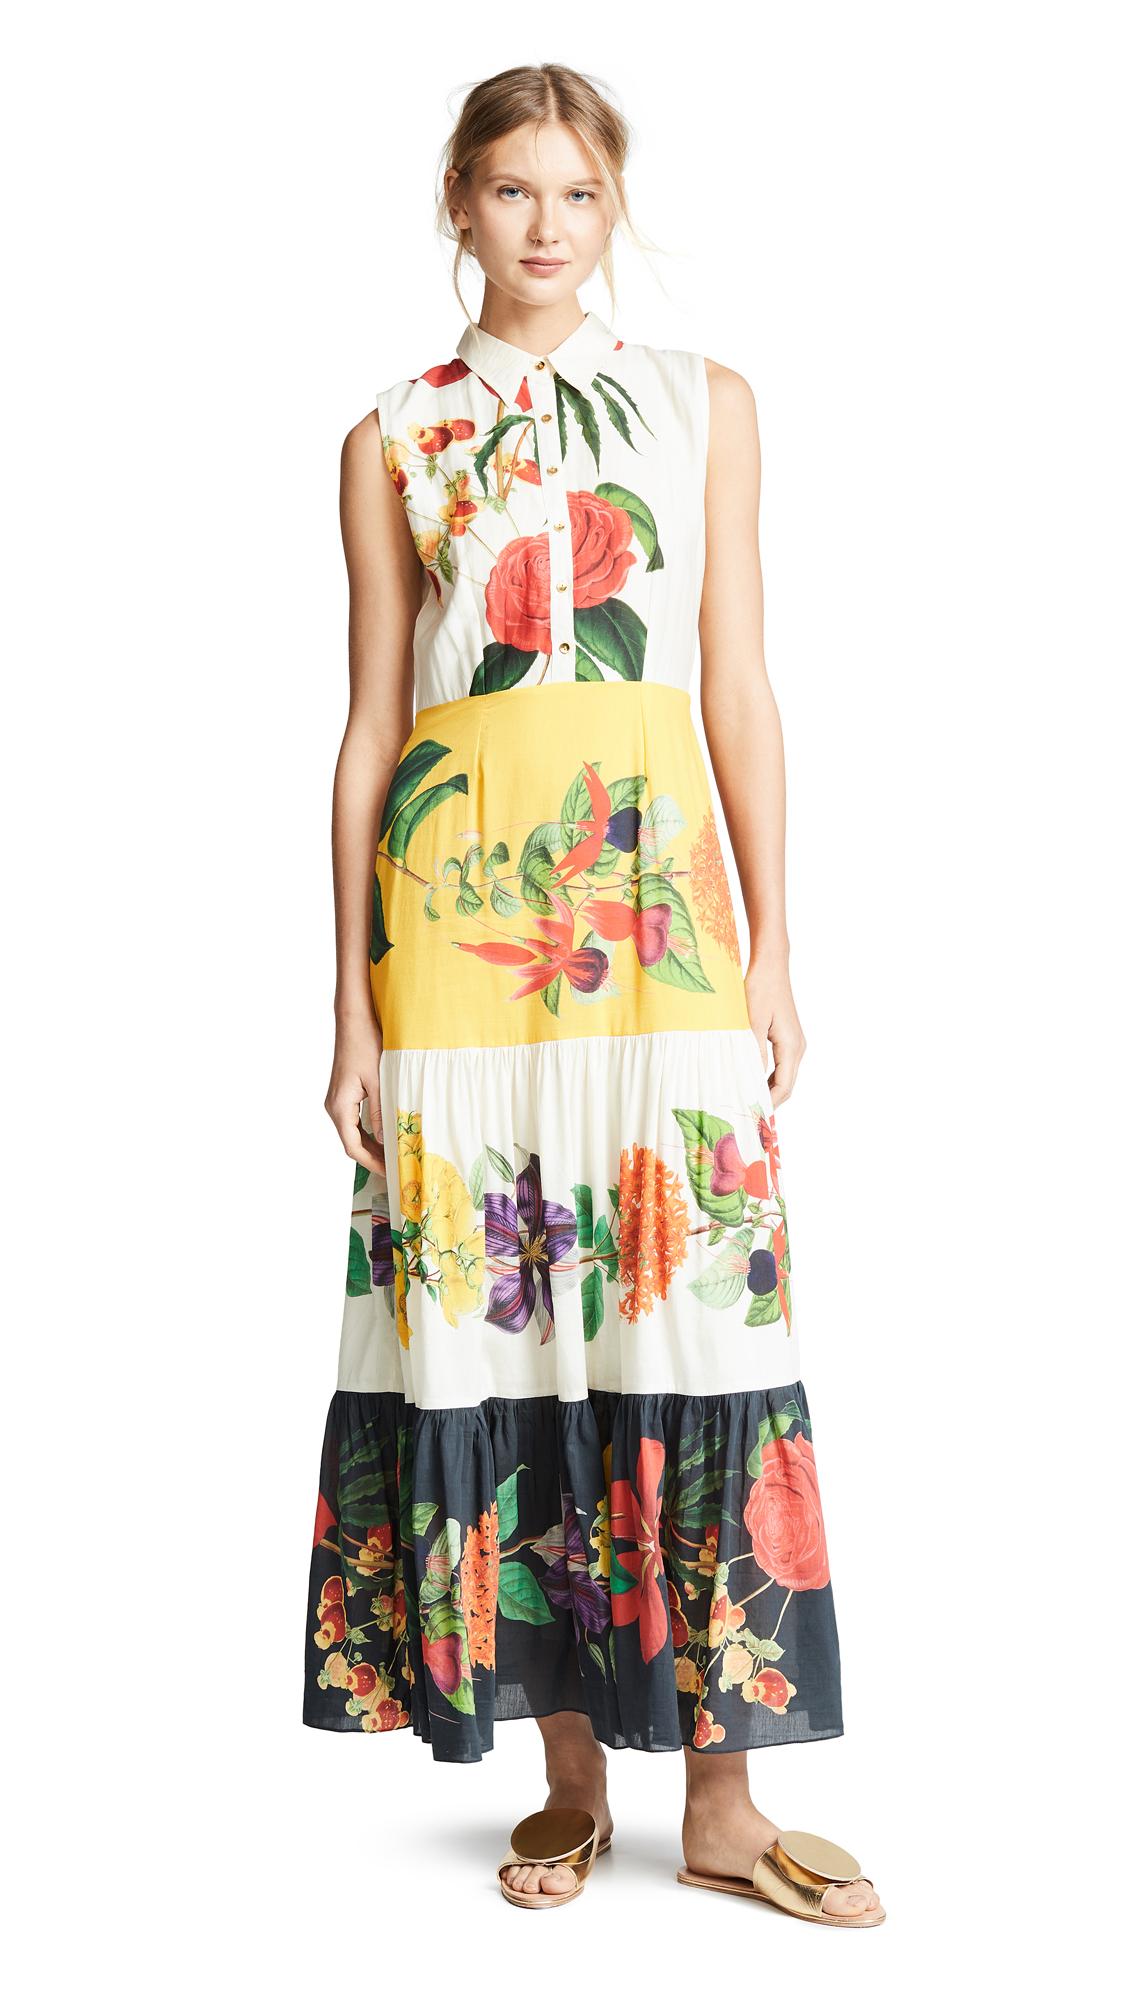 CAROLINA K Natalie Sleeveless Dress in Big Flower Multi